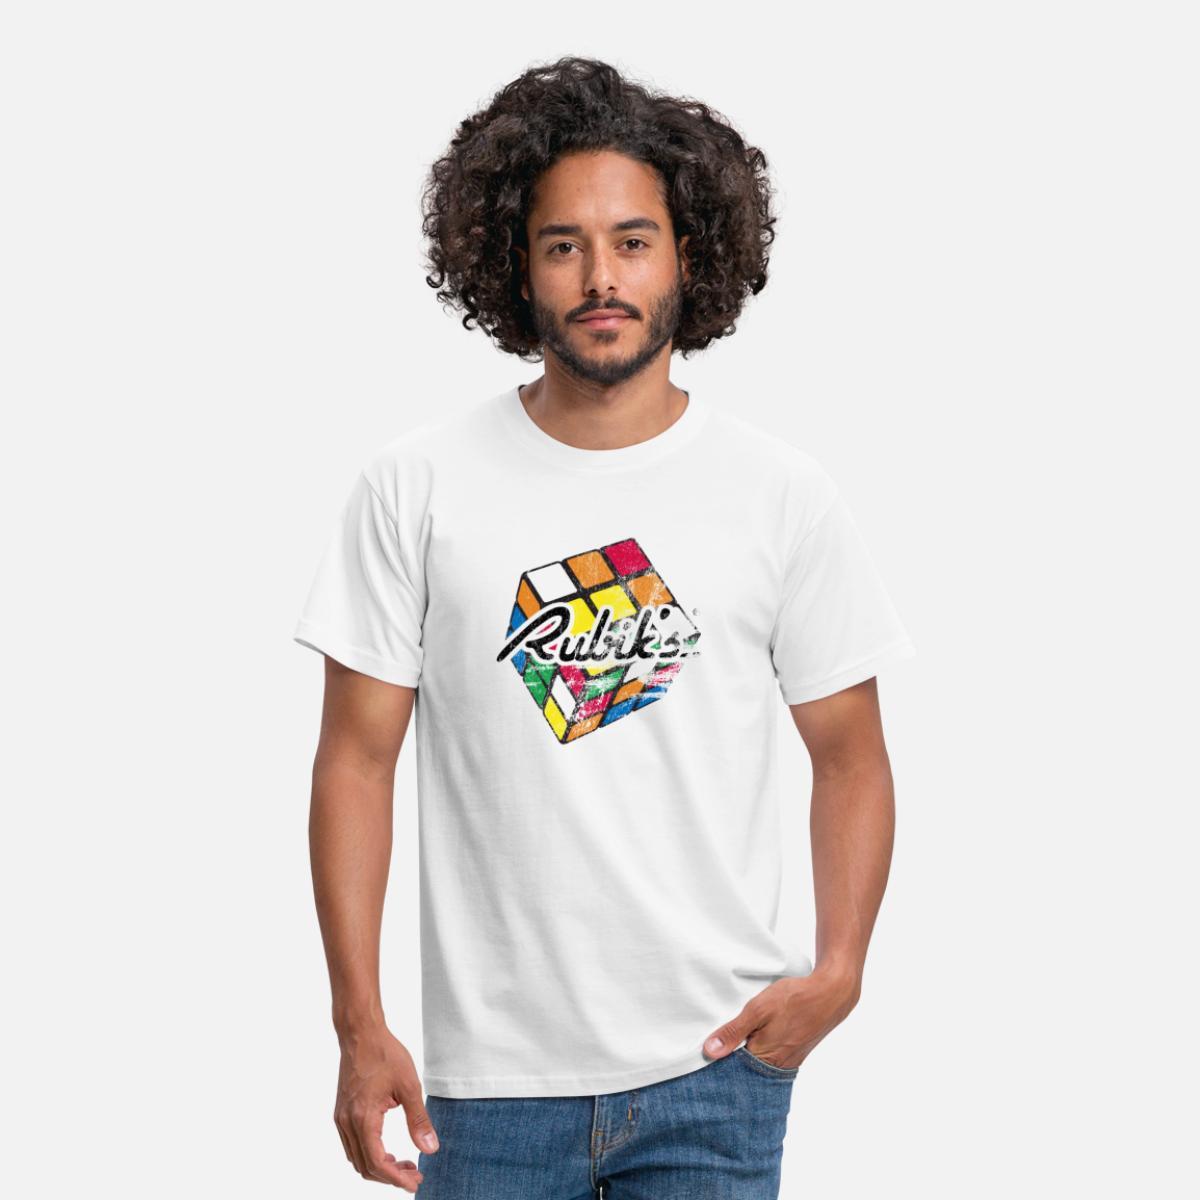 9a299ad0f53b Rubik's Cube Distressed Men's T-Shirt - white